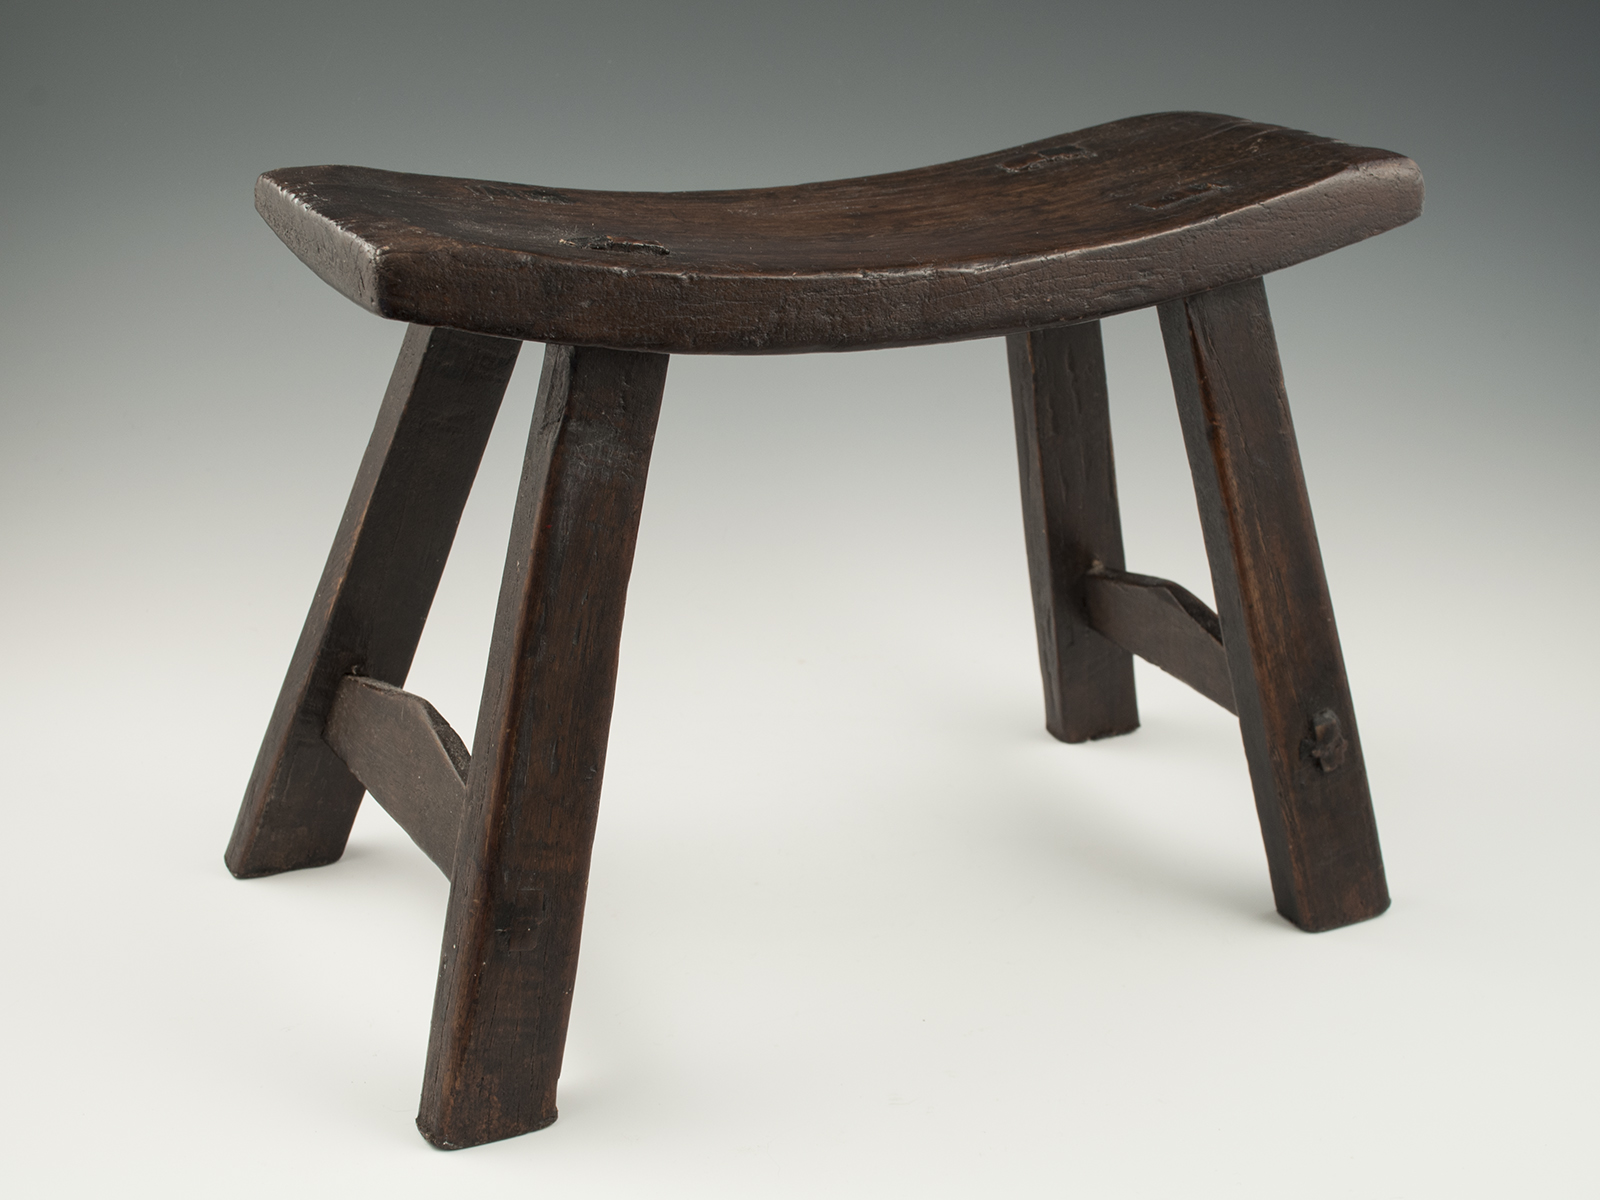 Remarkable Asian Tribal Art Stool China Beatyapartments Chair Design Images Beatyapartmentscom